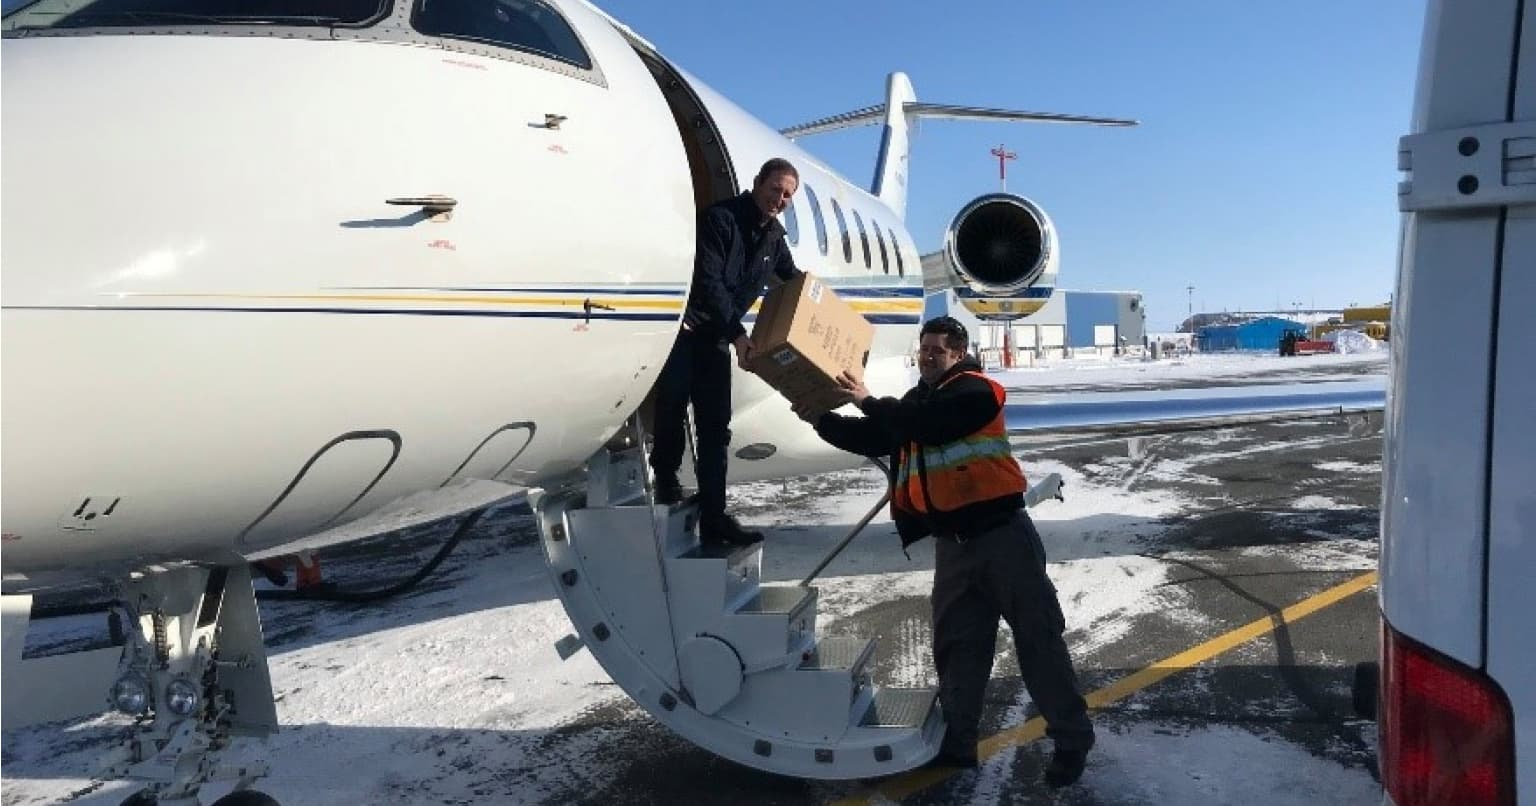 Suncor staff loading masks onto plane